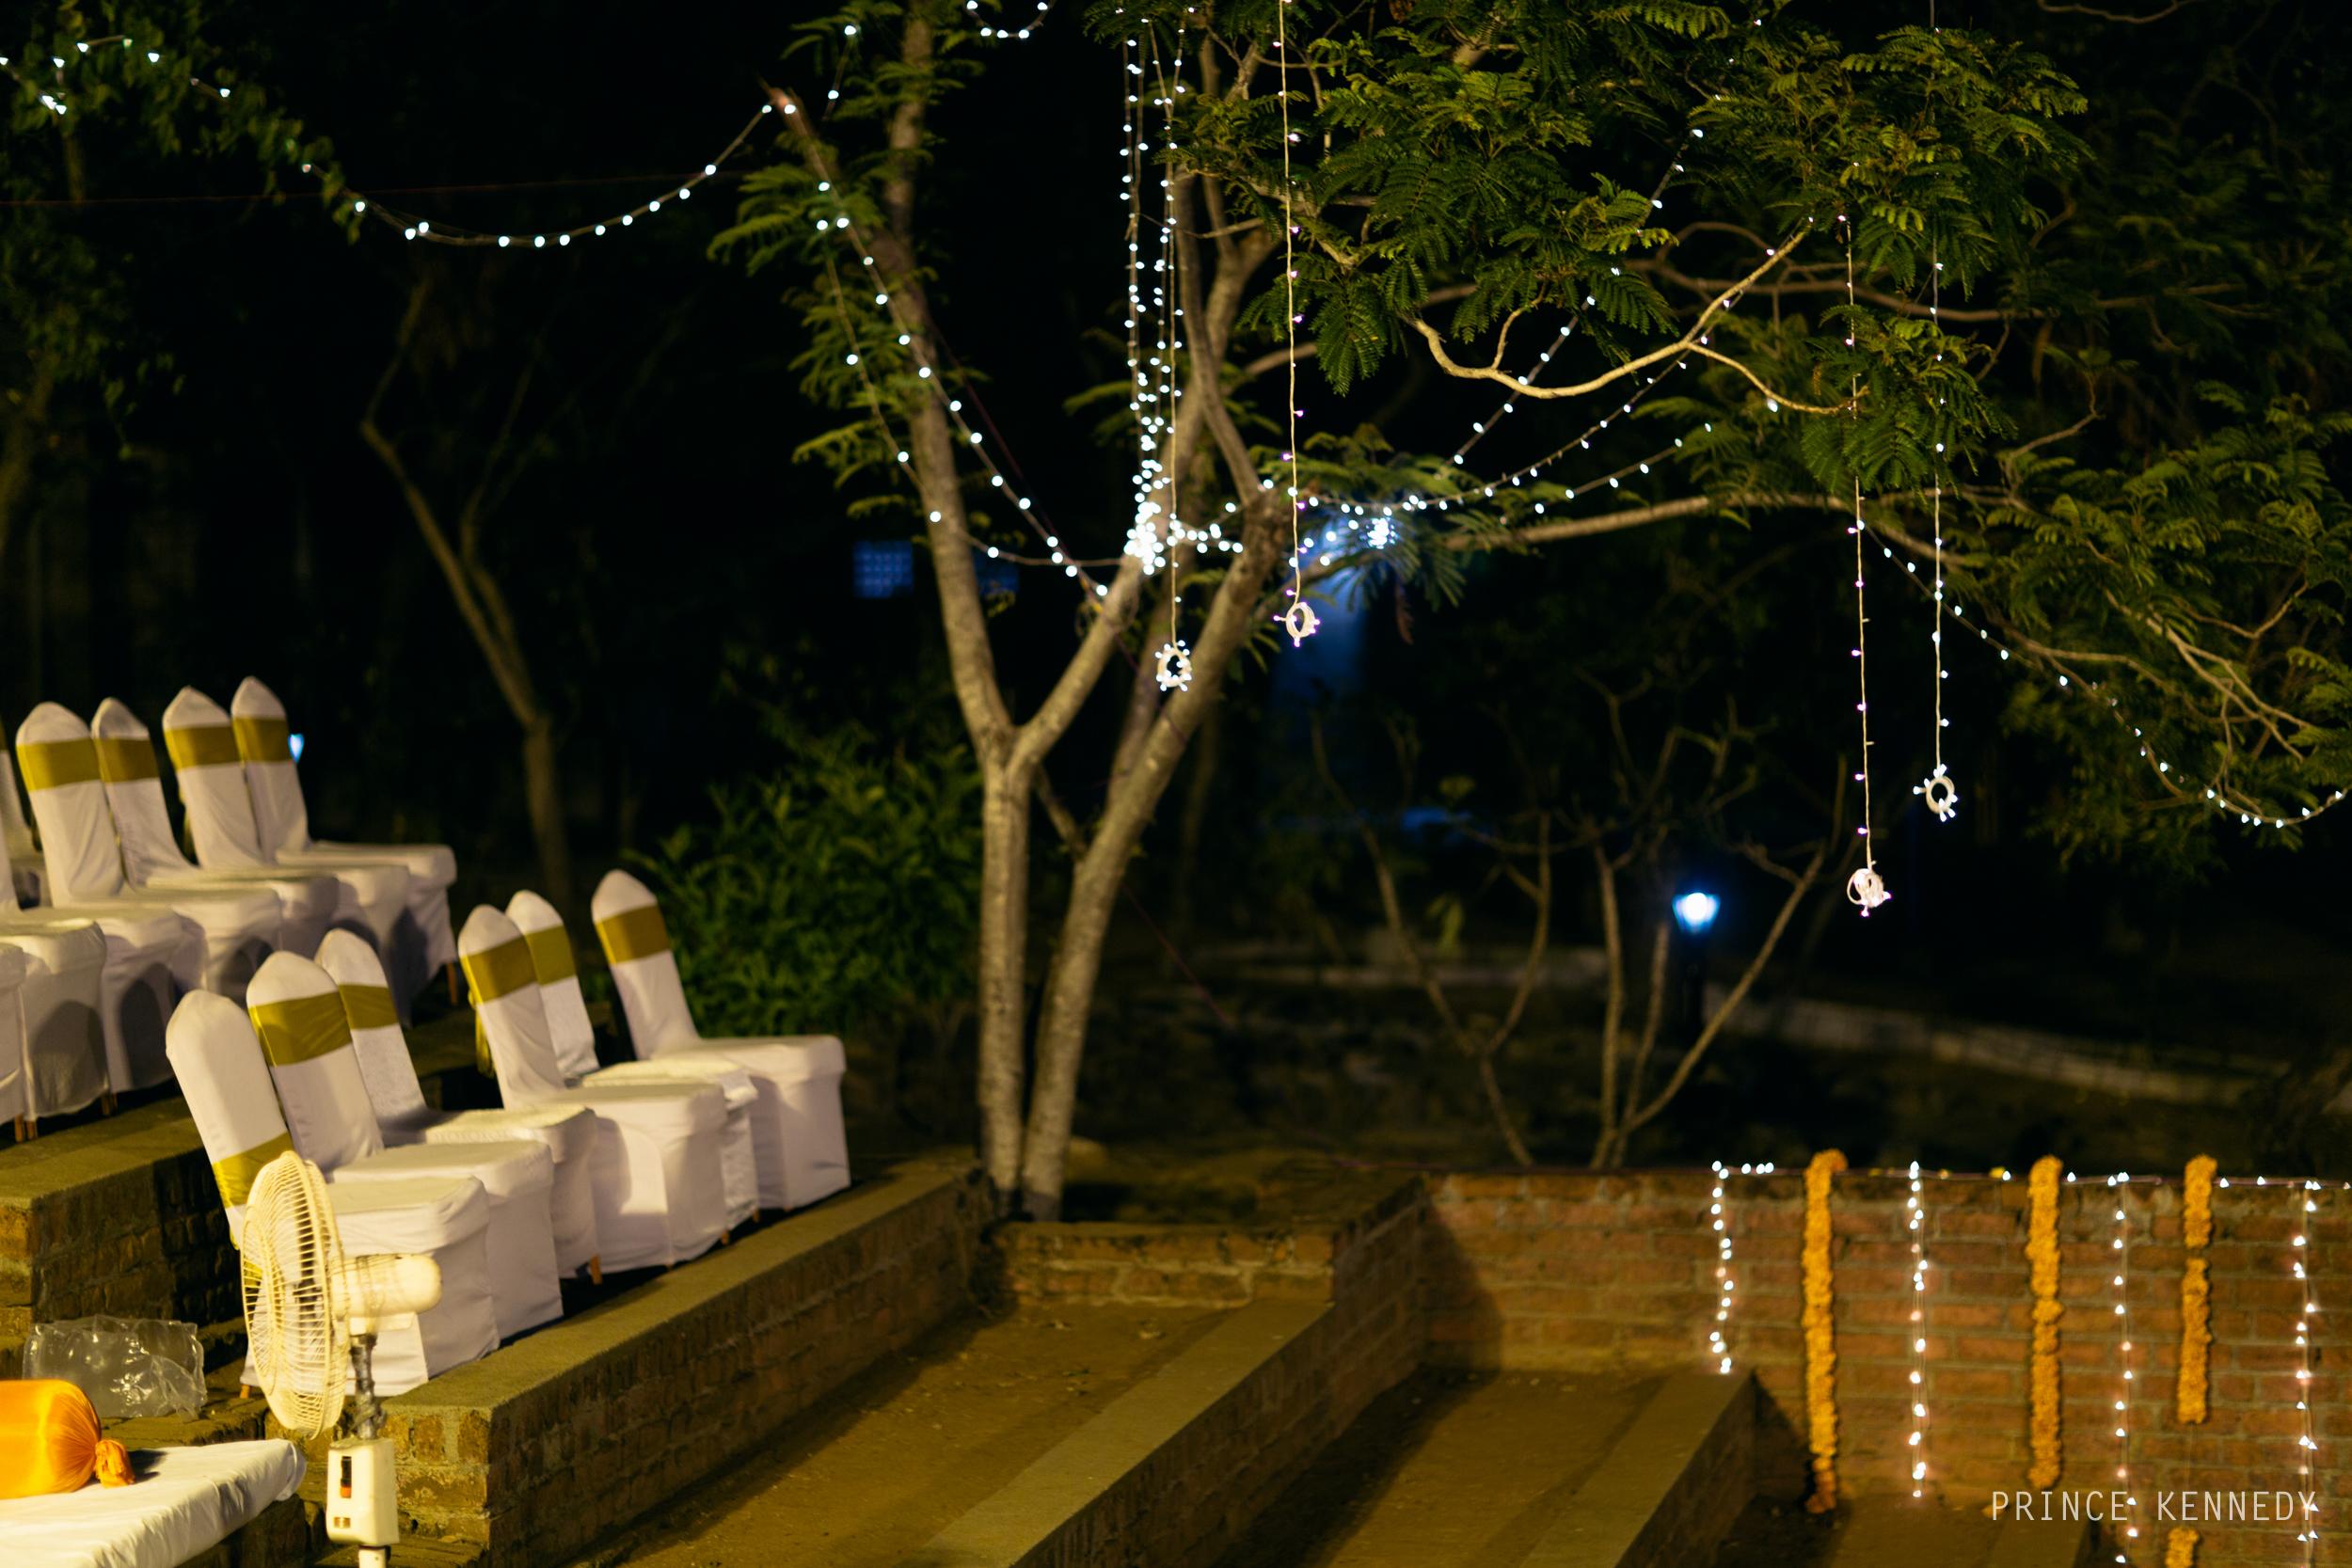 Athmajja-Nithesh-Engagement-Couple-Portrait-Portraiture-Wedding-Couple-Portrait-Chennai-Photographer-Candid-Photography-Destination-Best-Prince-Kennedy-Photography-175.jpg